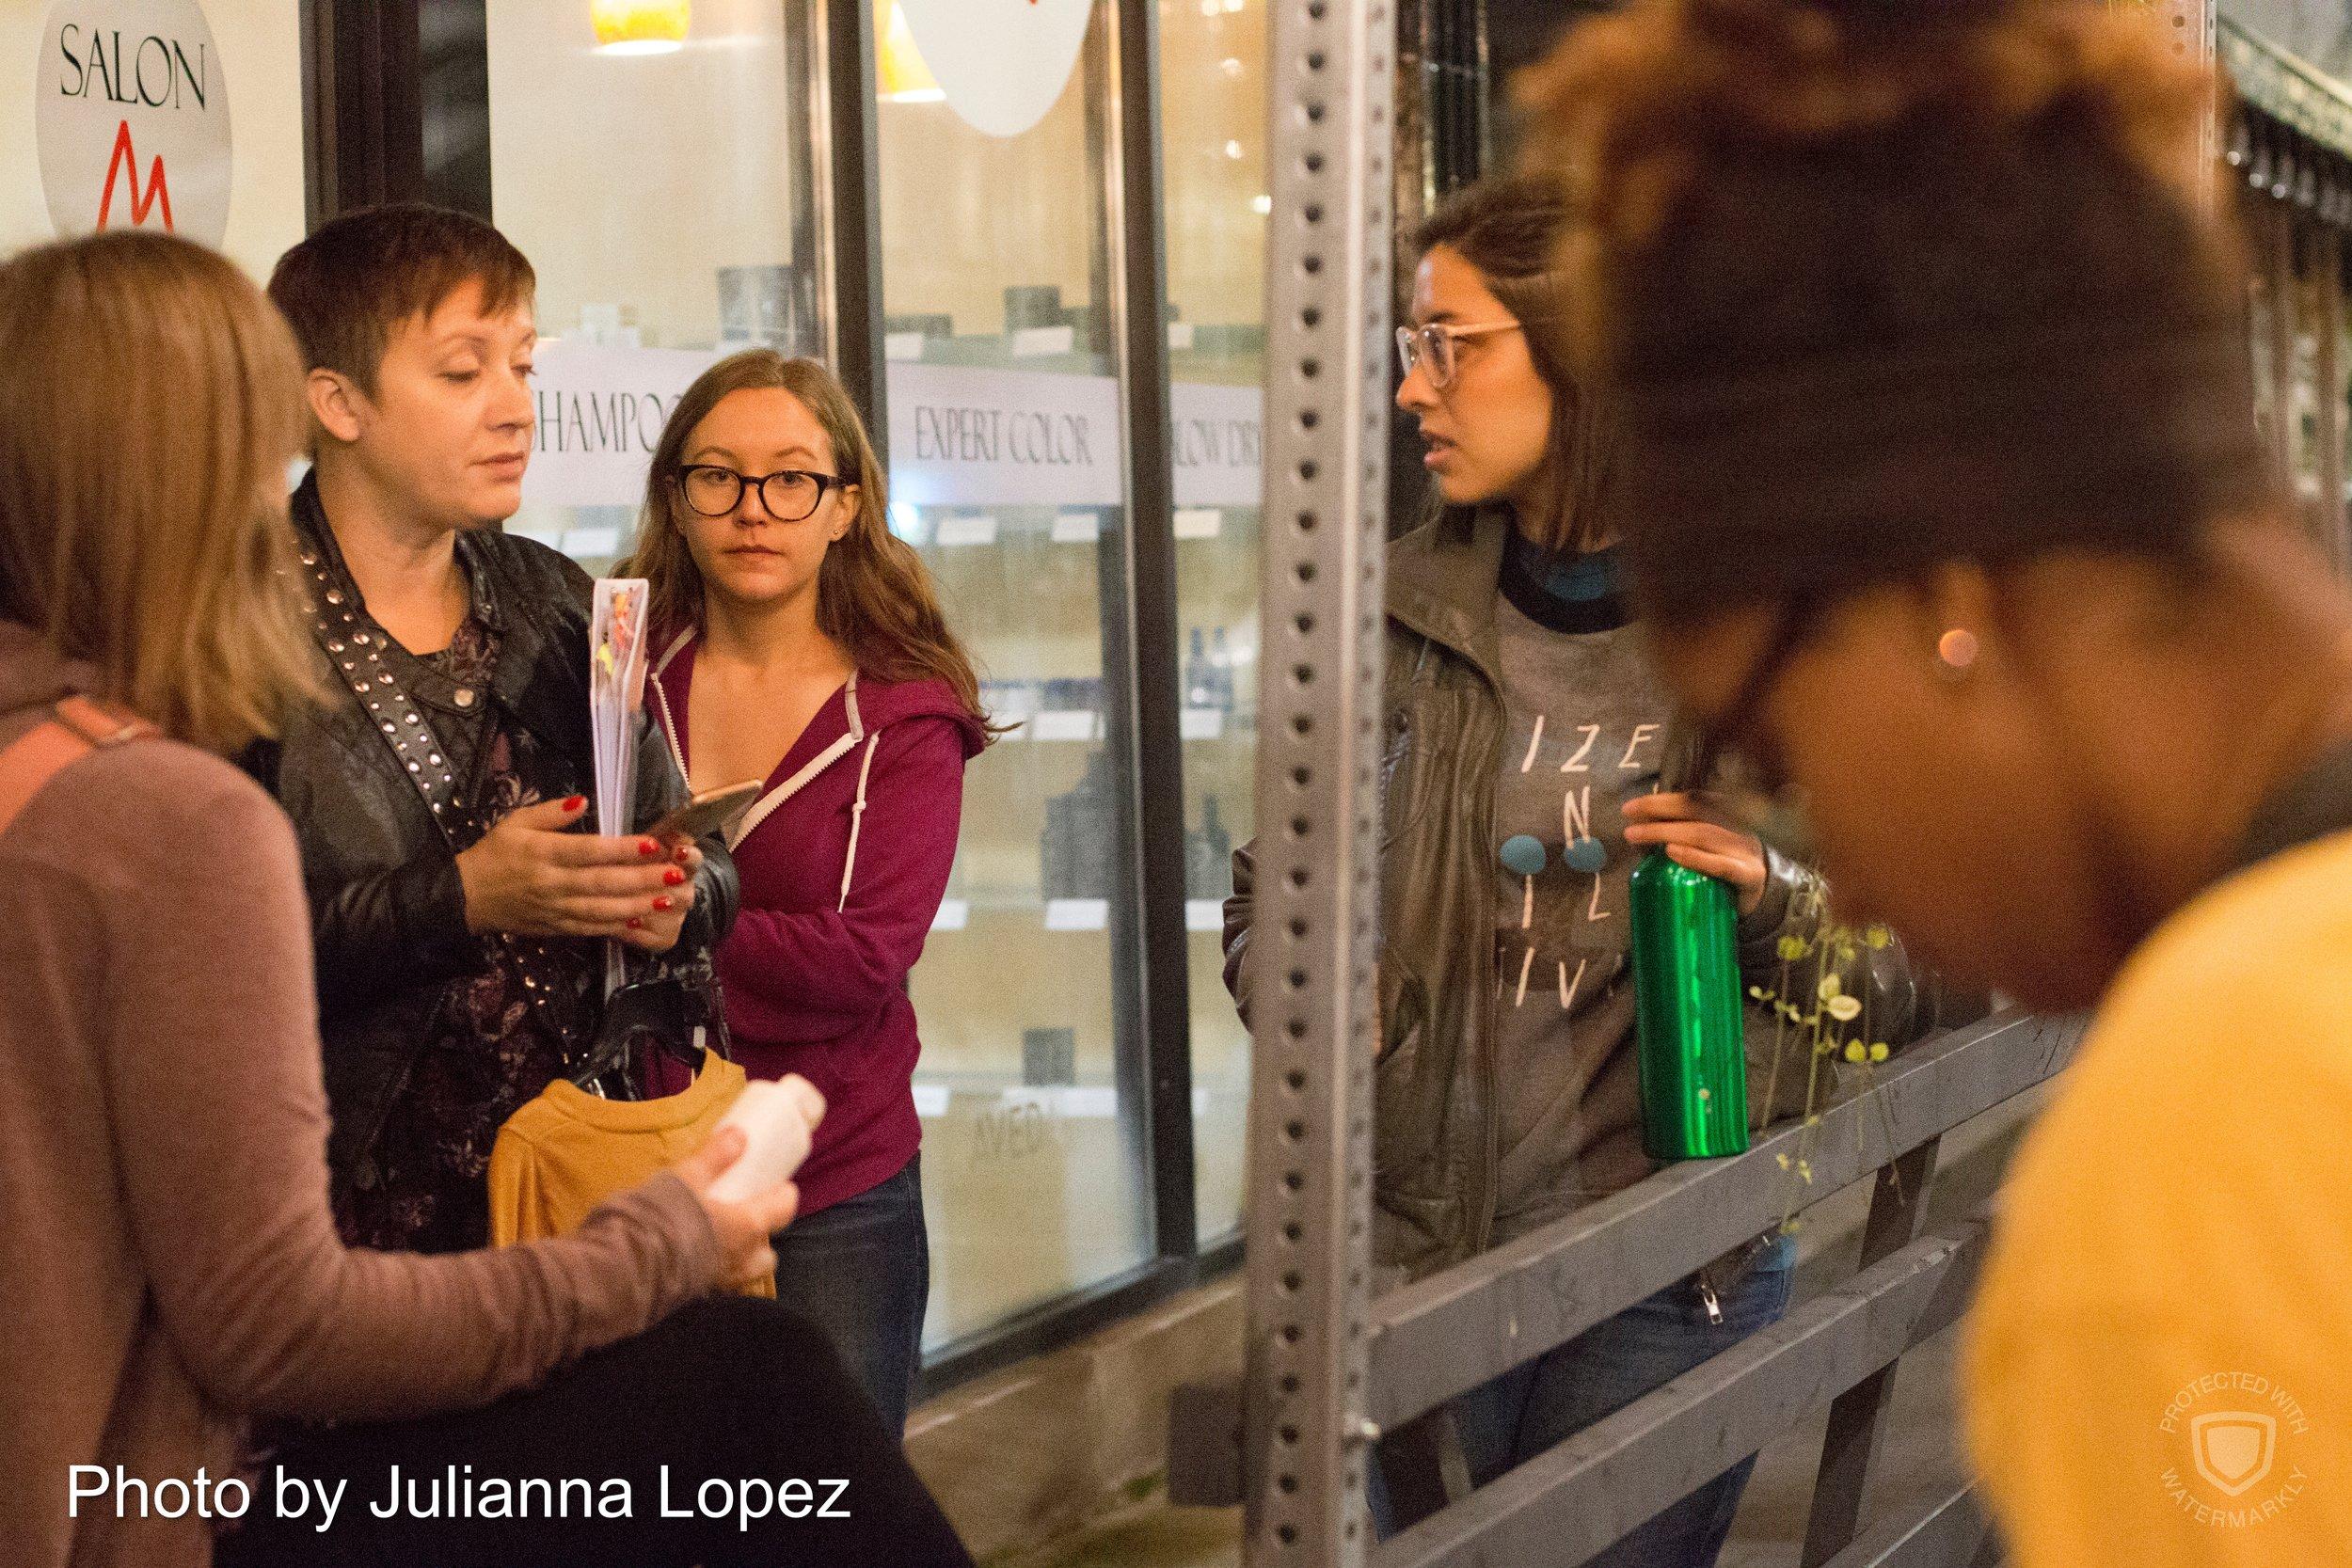 Julianna Lopez - IMG_6366.jpg